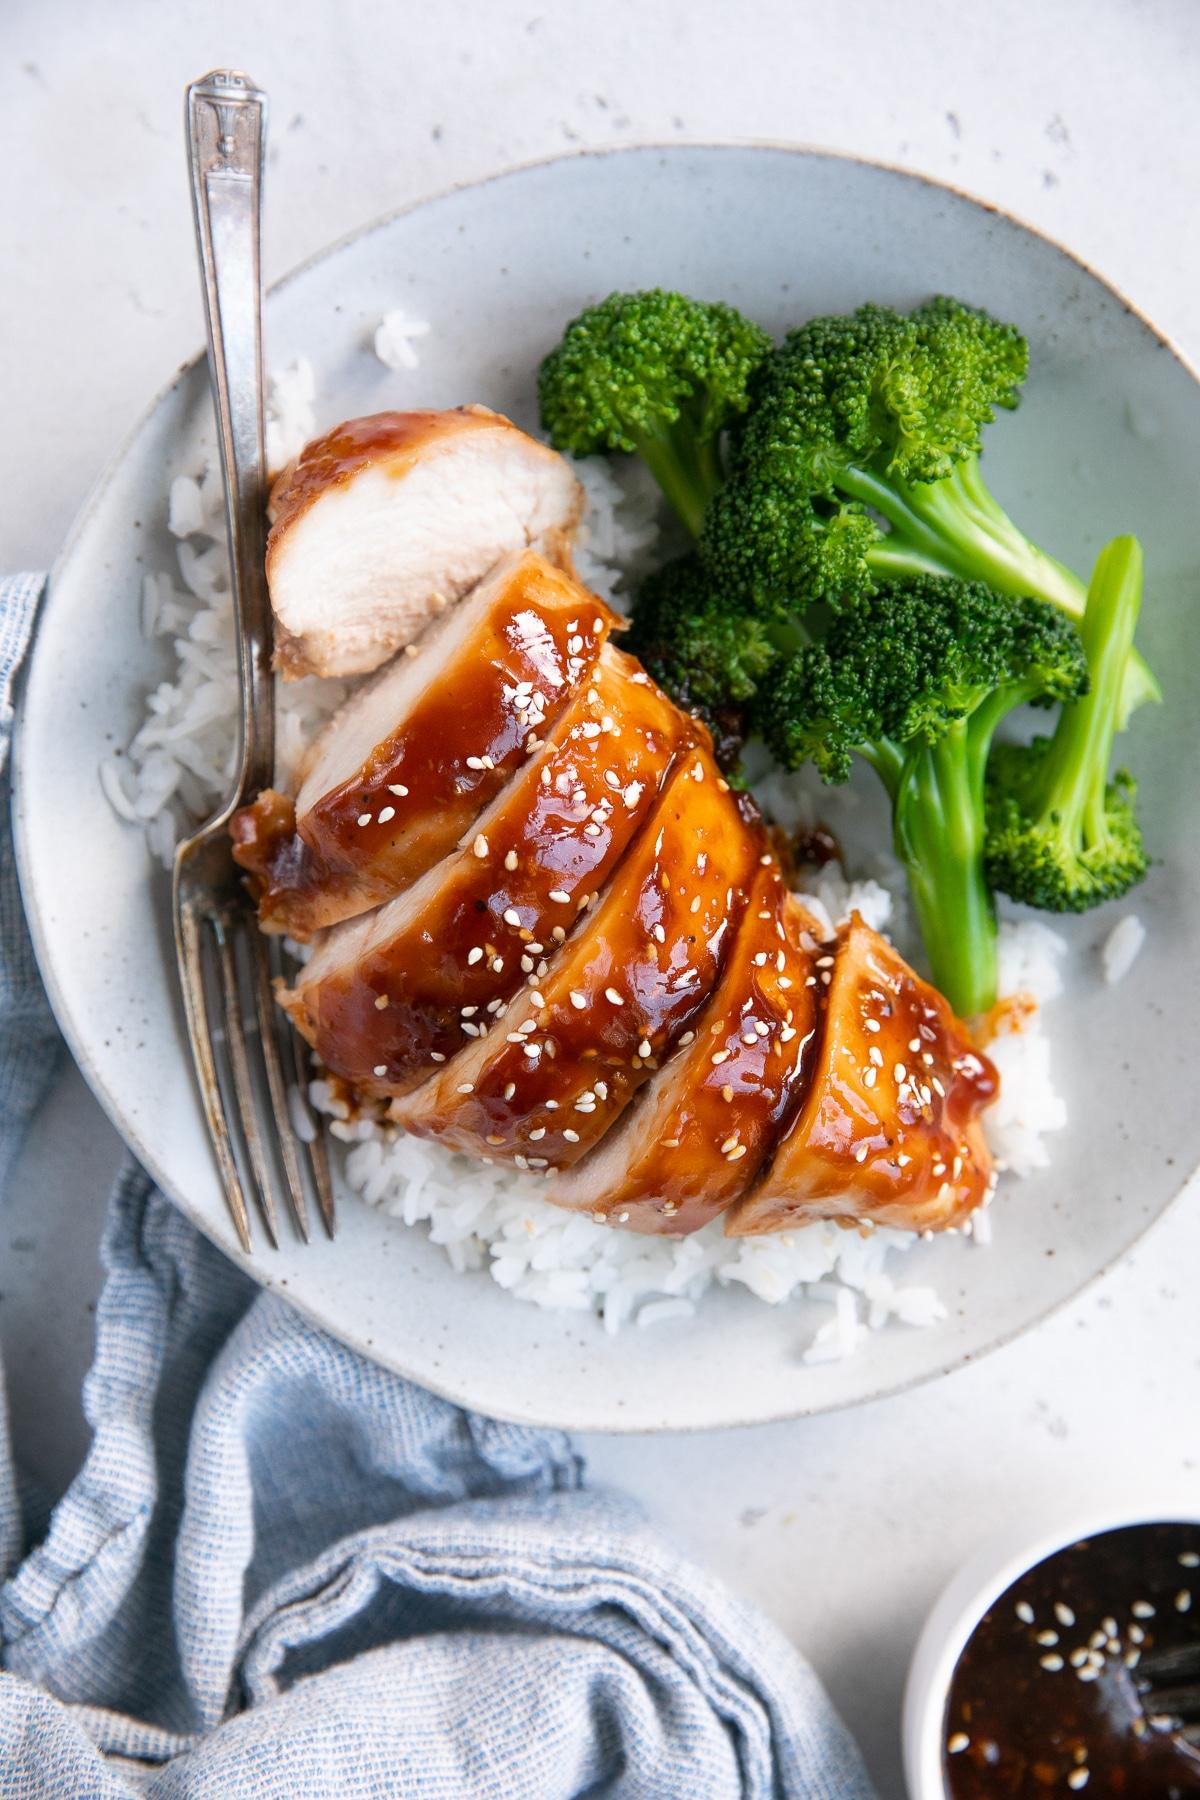 Easy Teriyaki Chicken Recipe How To Make Teriyaki Chicken The Forked Spoon